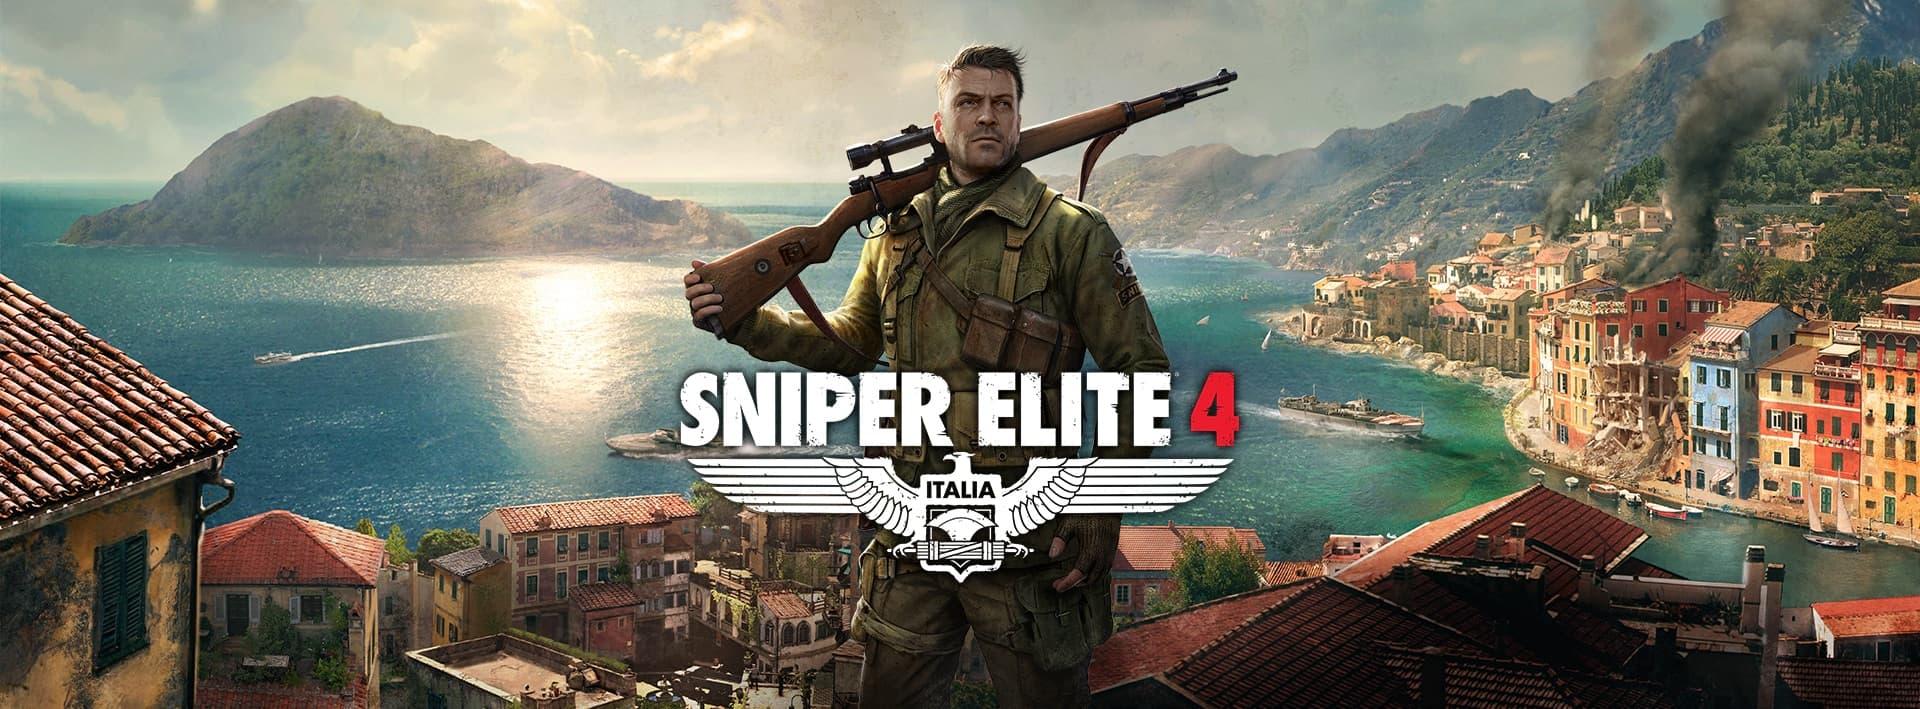 متطلبات تشغيل Sniper Elite 4